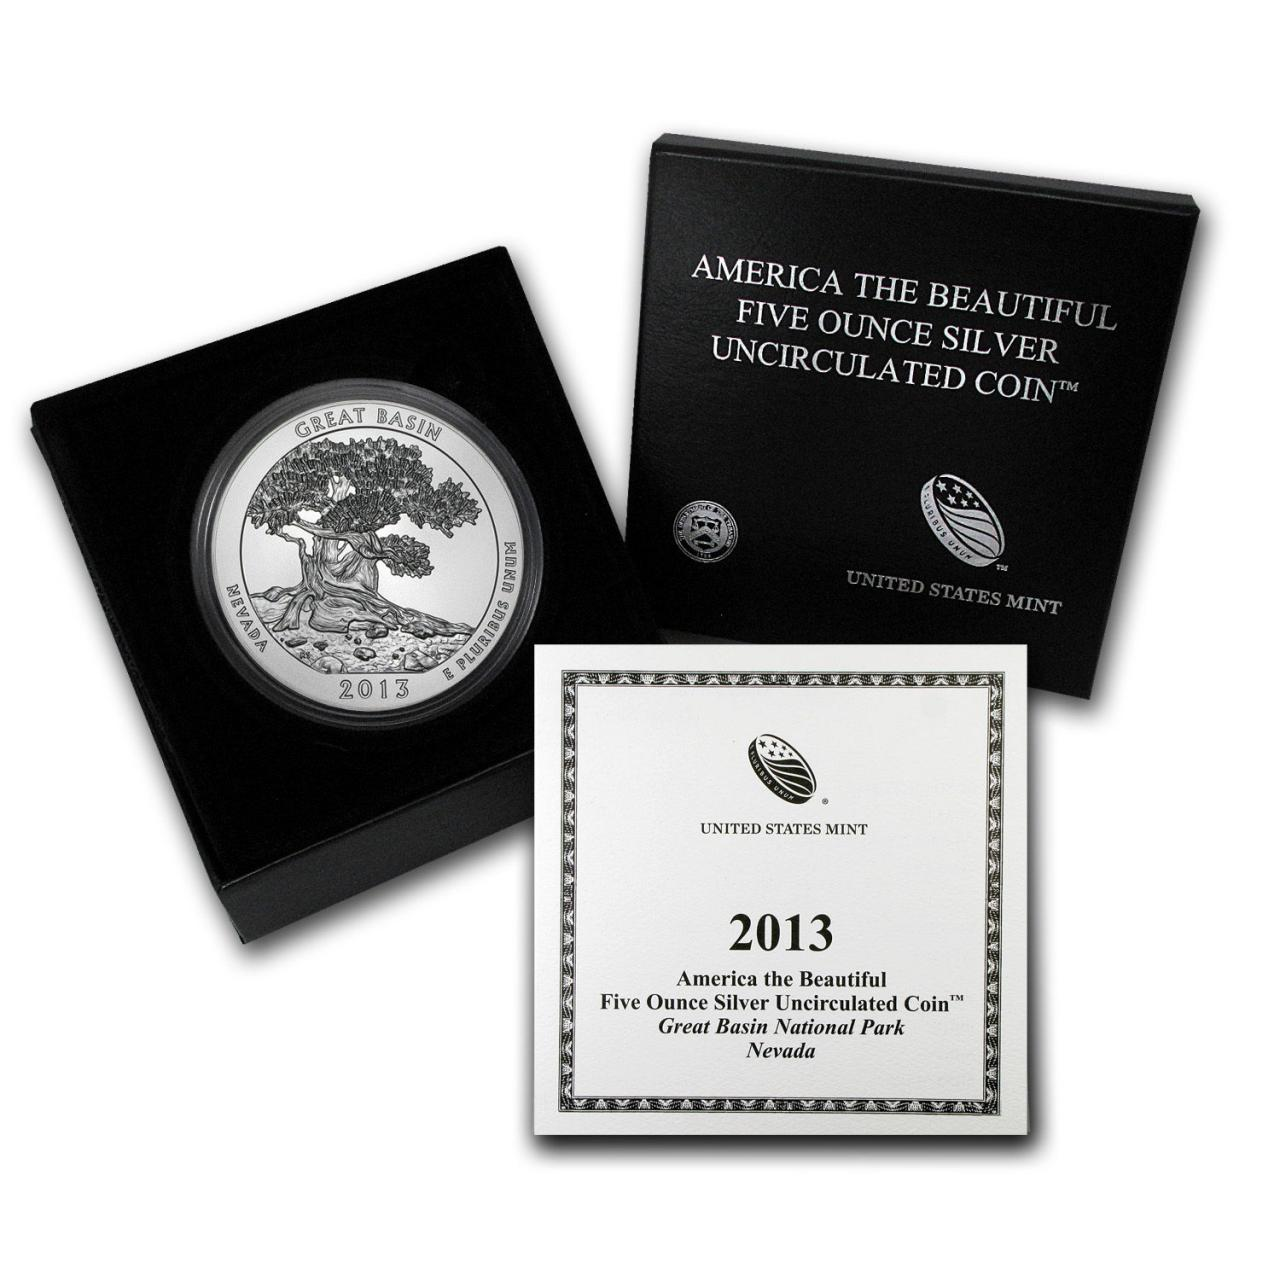 2013 5 oz Silver ATB Great Basin National Park Nevada